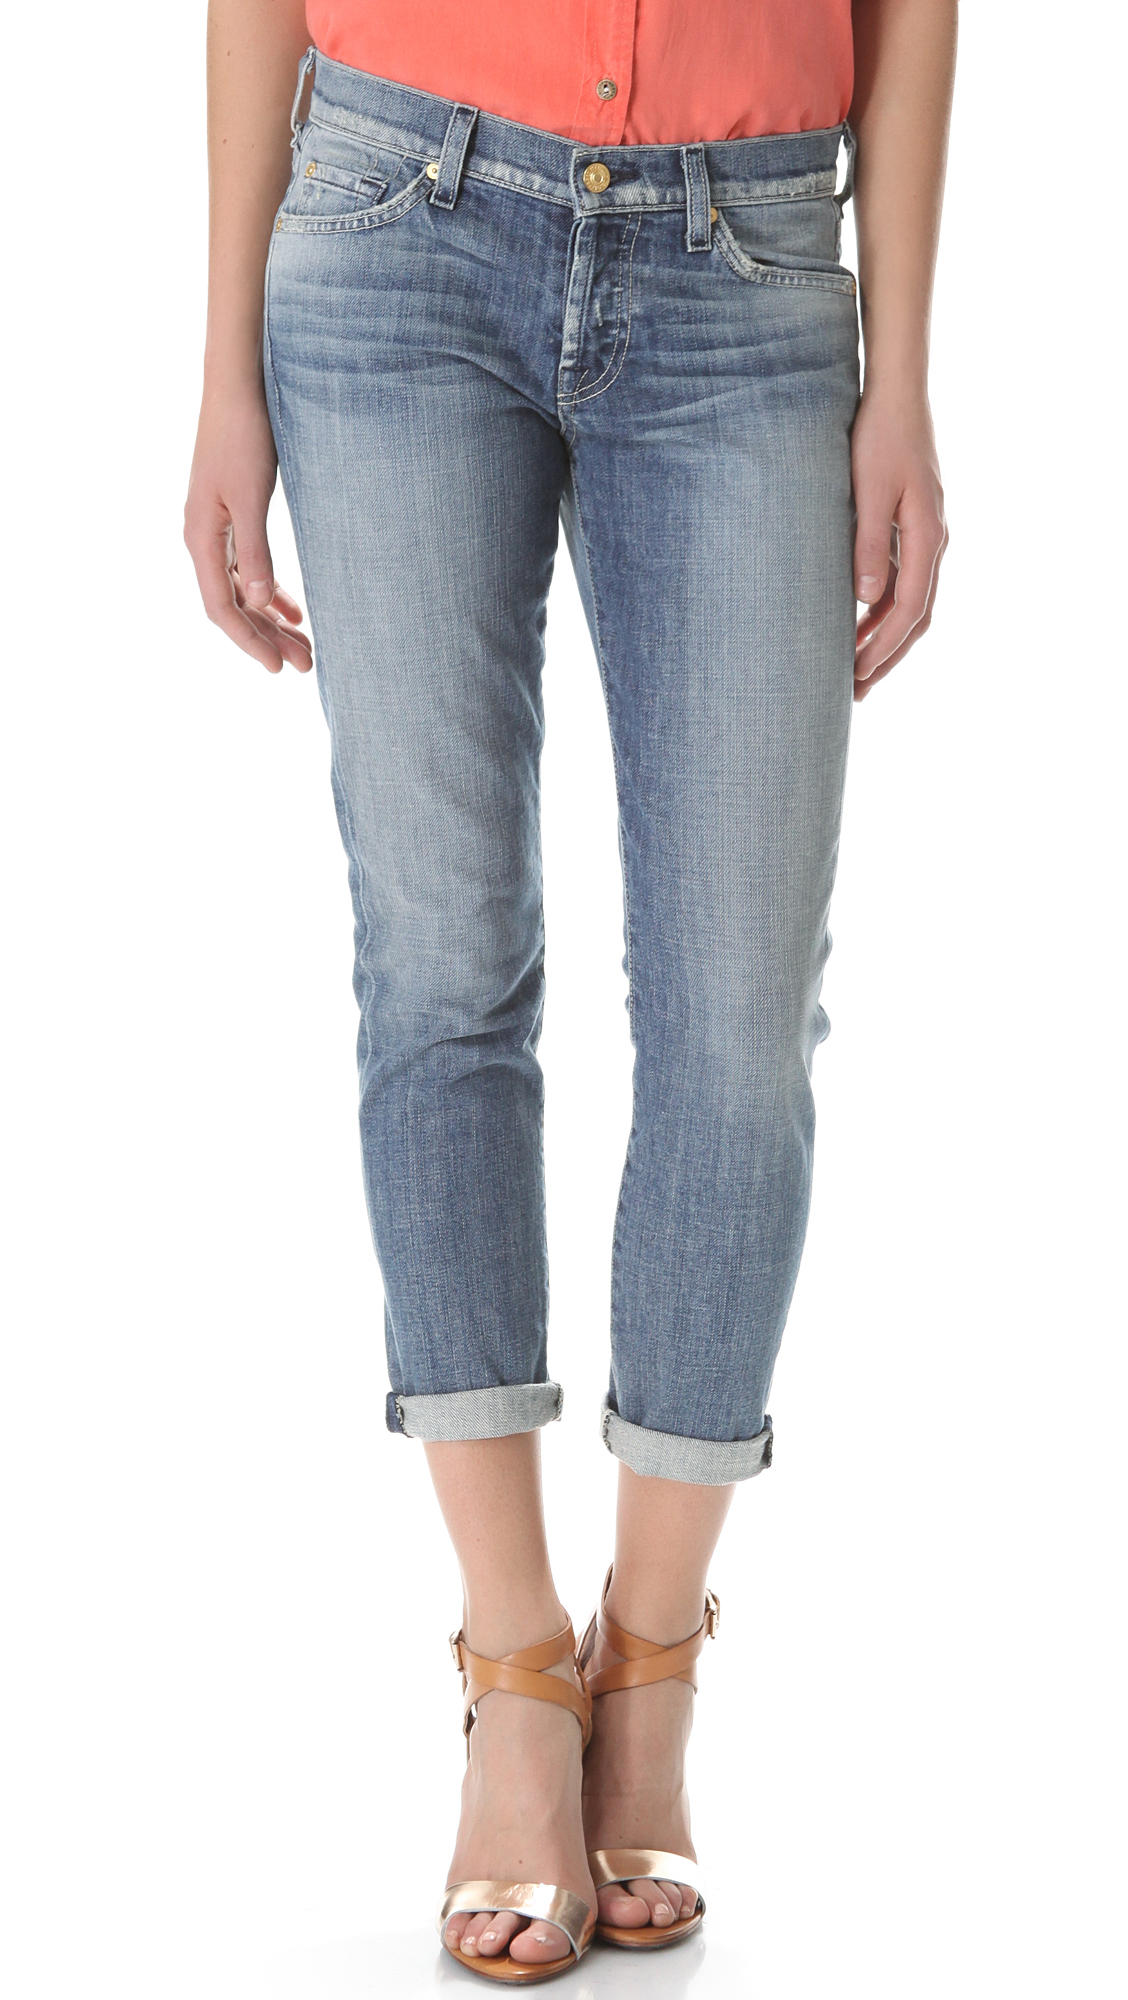 7 For All Mankind Josefina Boyfriend Jeans - Pure Light Blue in Blue (Pure Light Blue) | Lyst